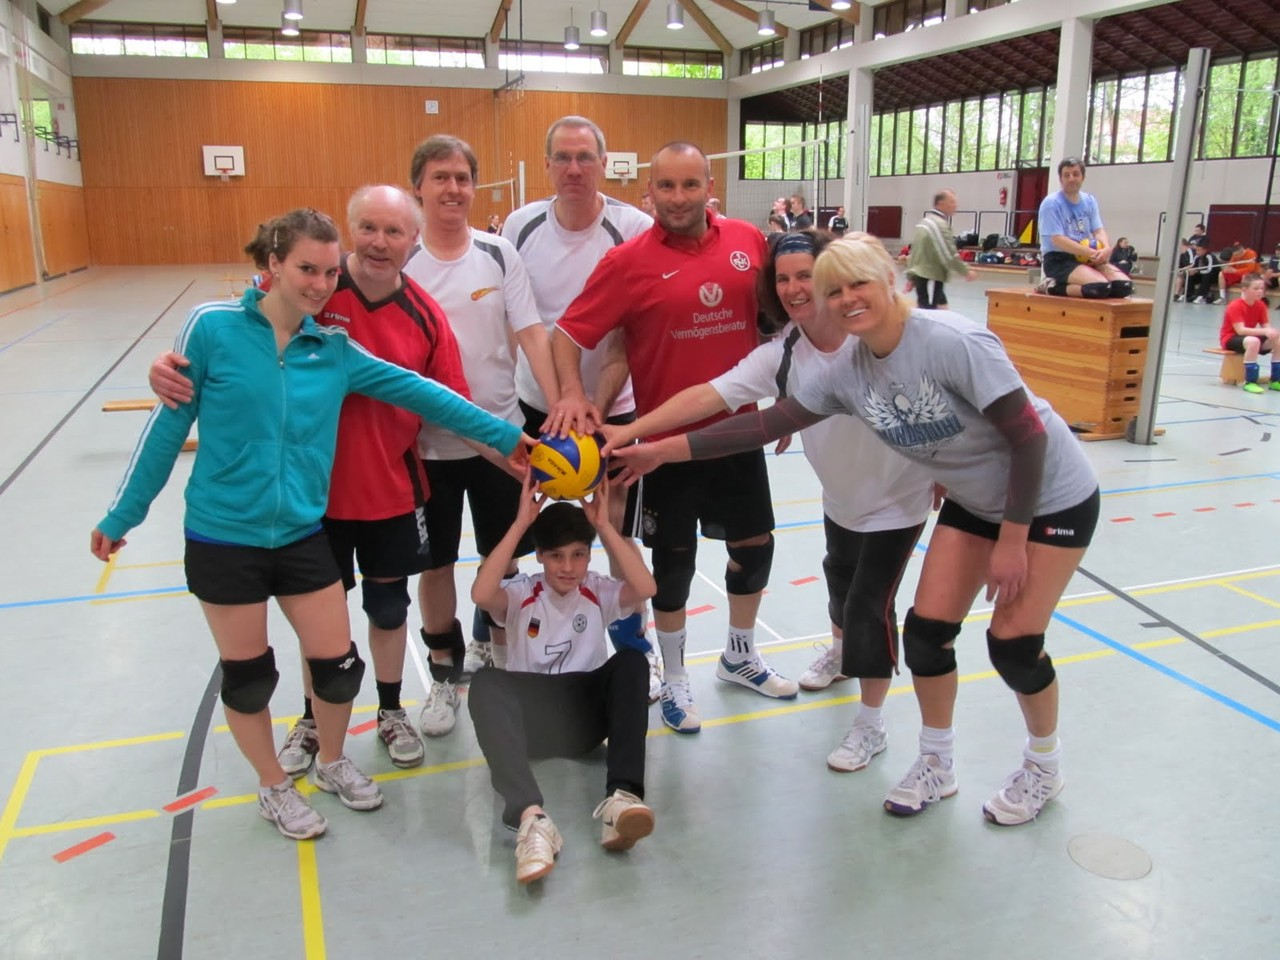 2013 mit Johanna, Kalle, Thilo, Michael, Elisabeth, Dana, vorne: Jakob